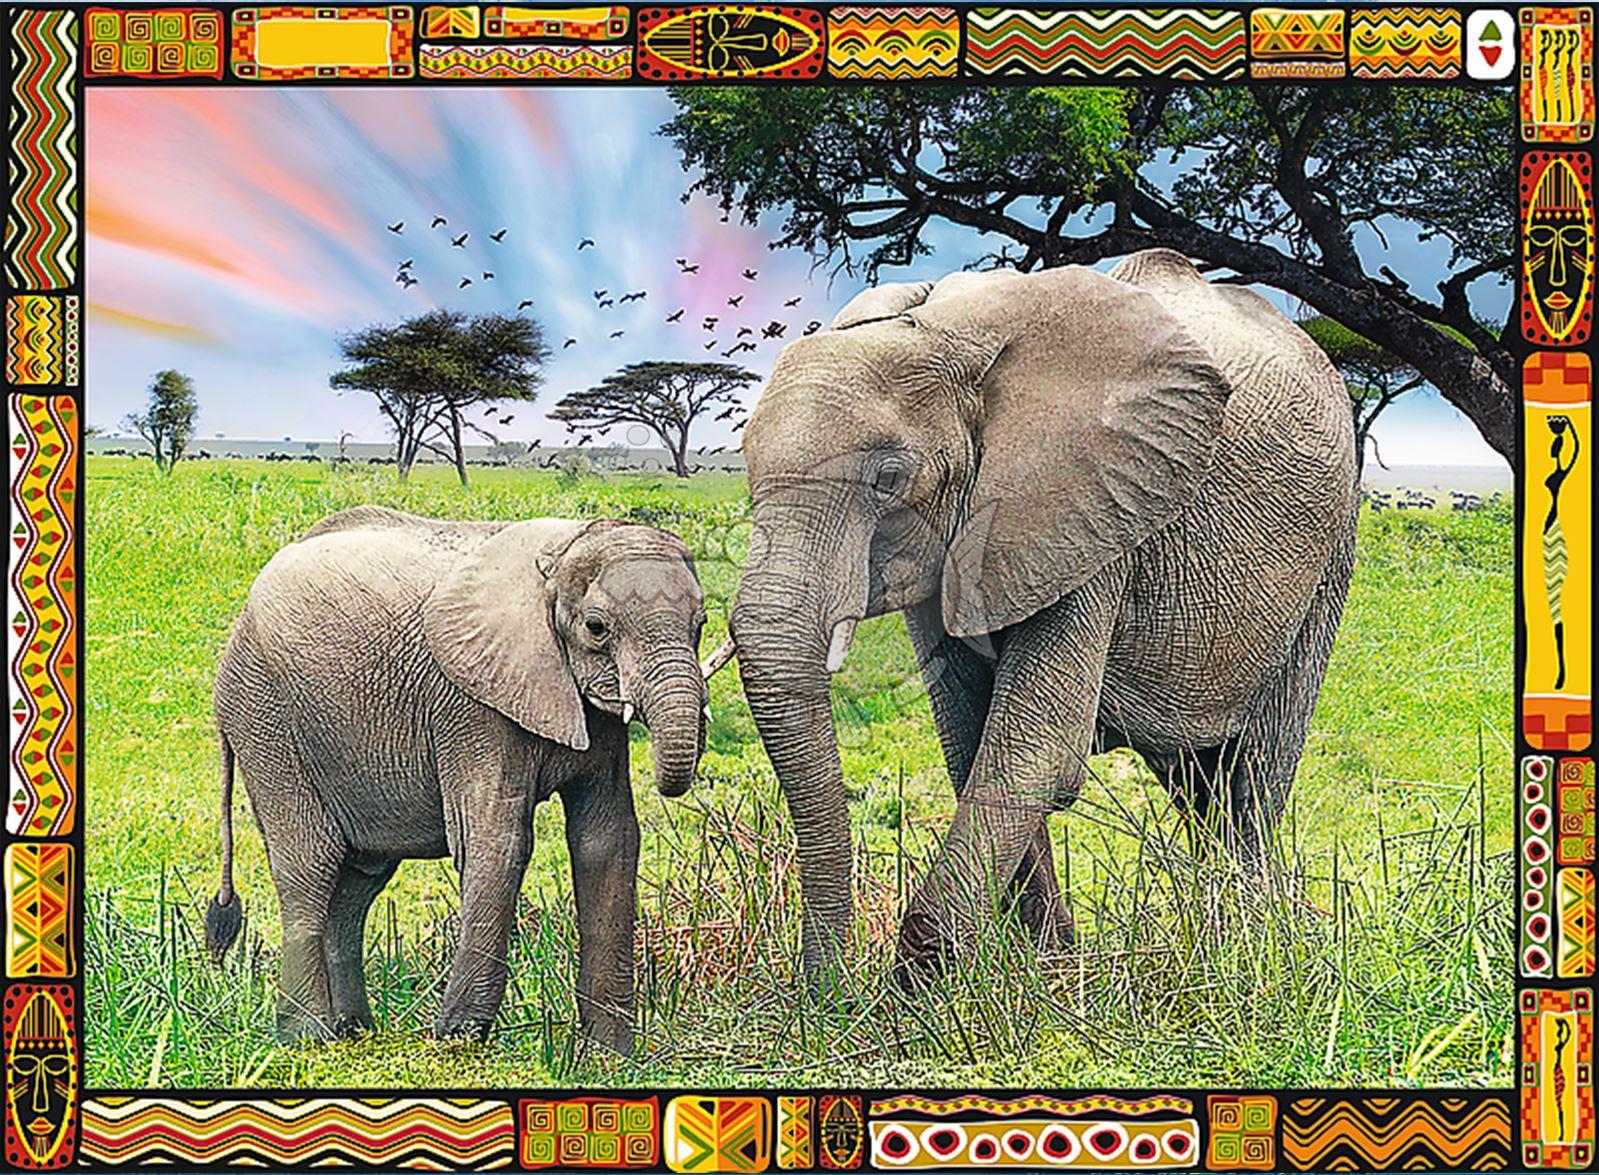 Trefl-300-500-1000-1500-2000-3000-4000-6000-Piece-Jigsaw-Puzzle-Landscapes-City thumbnail 323